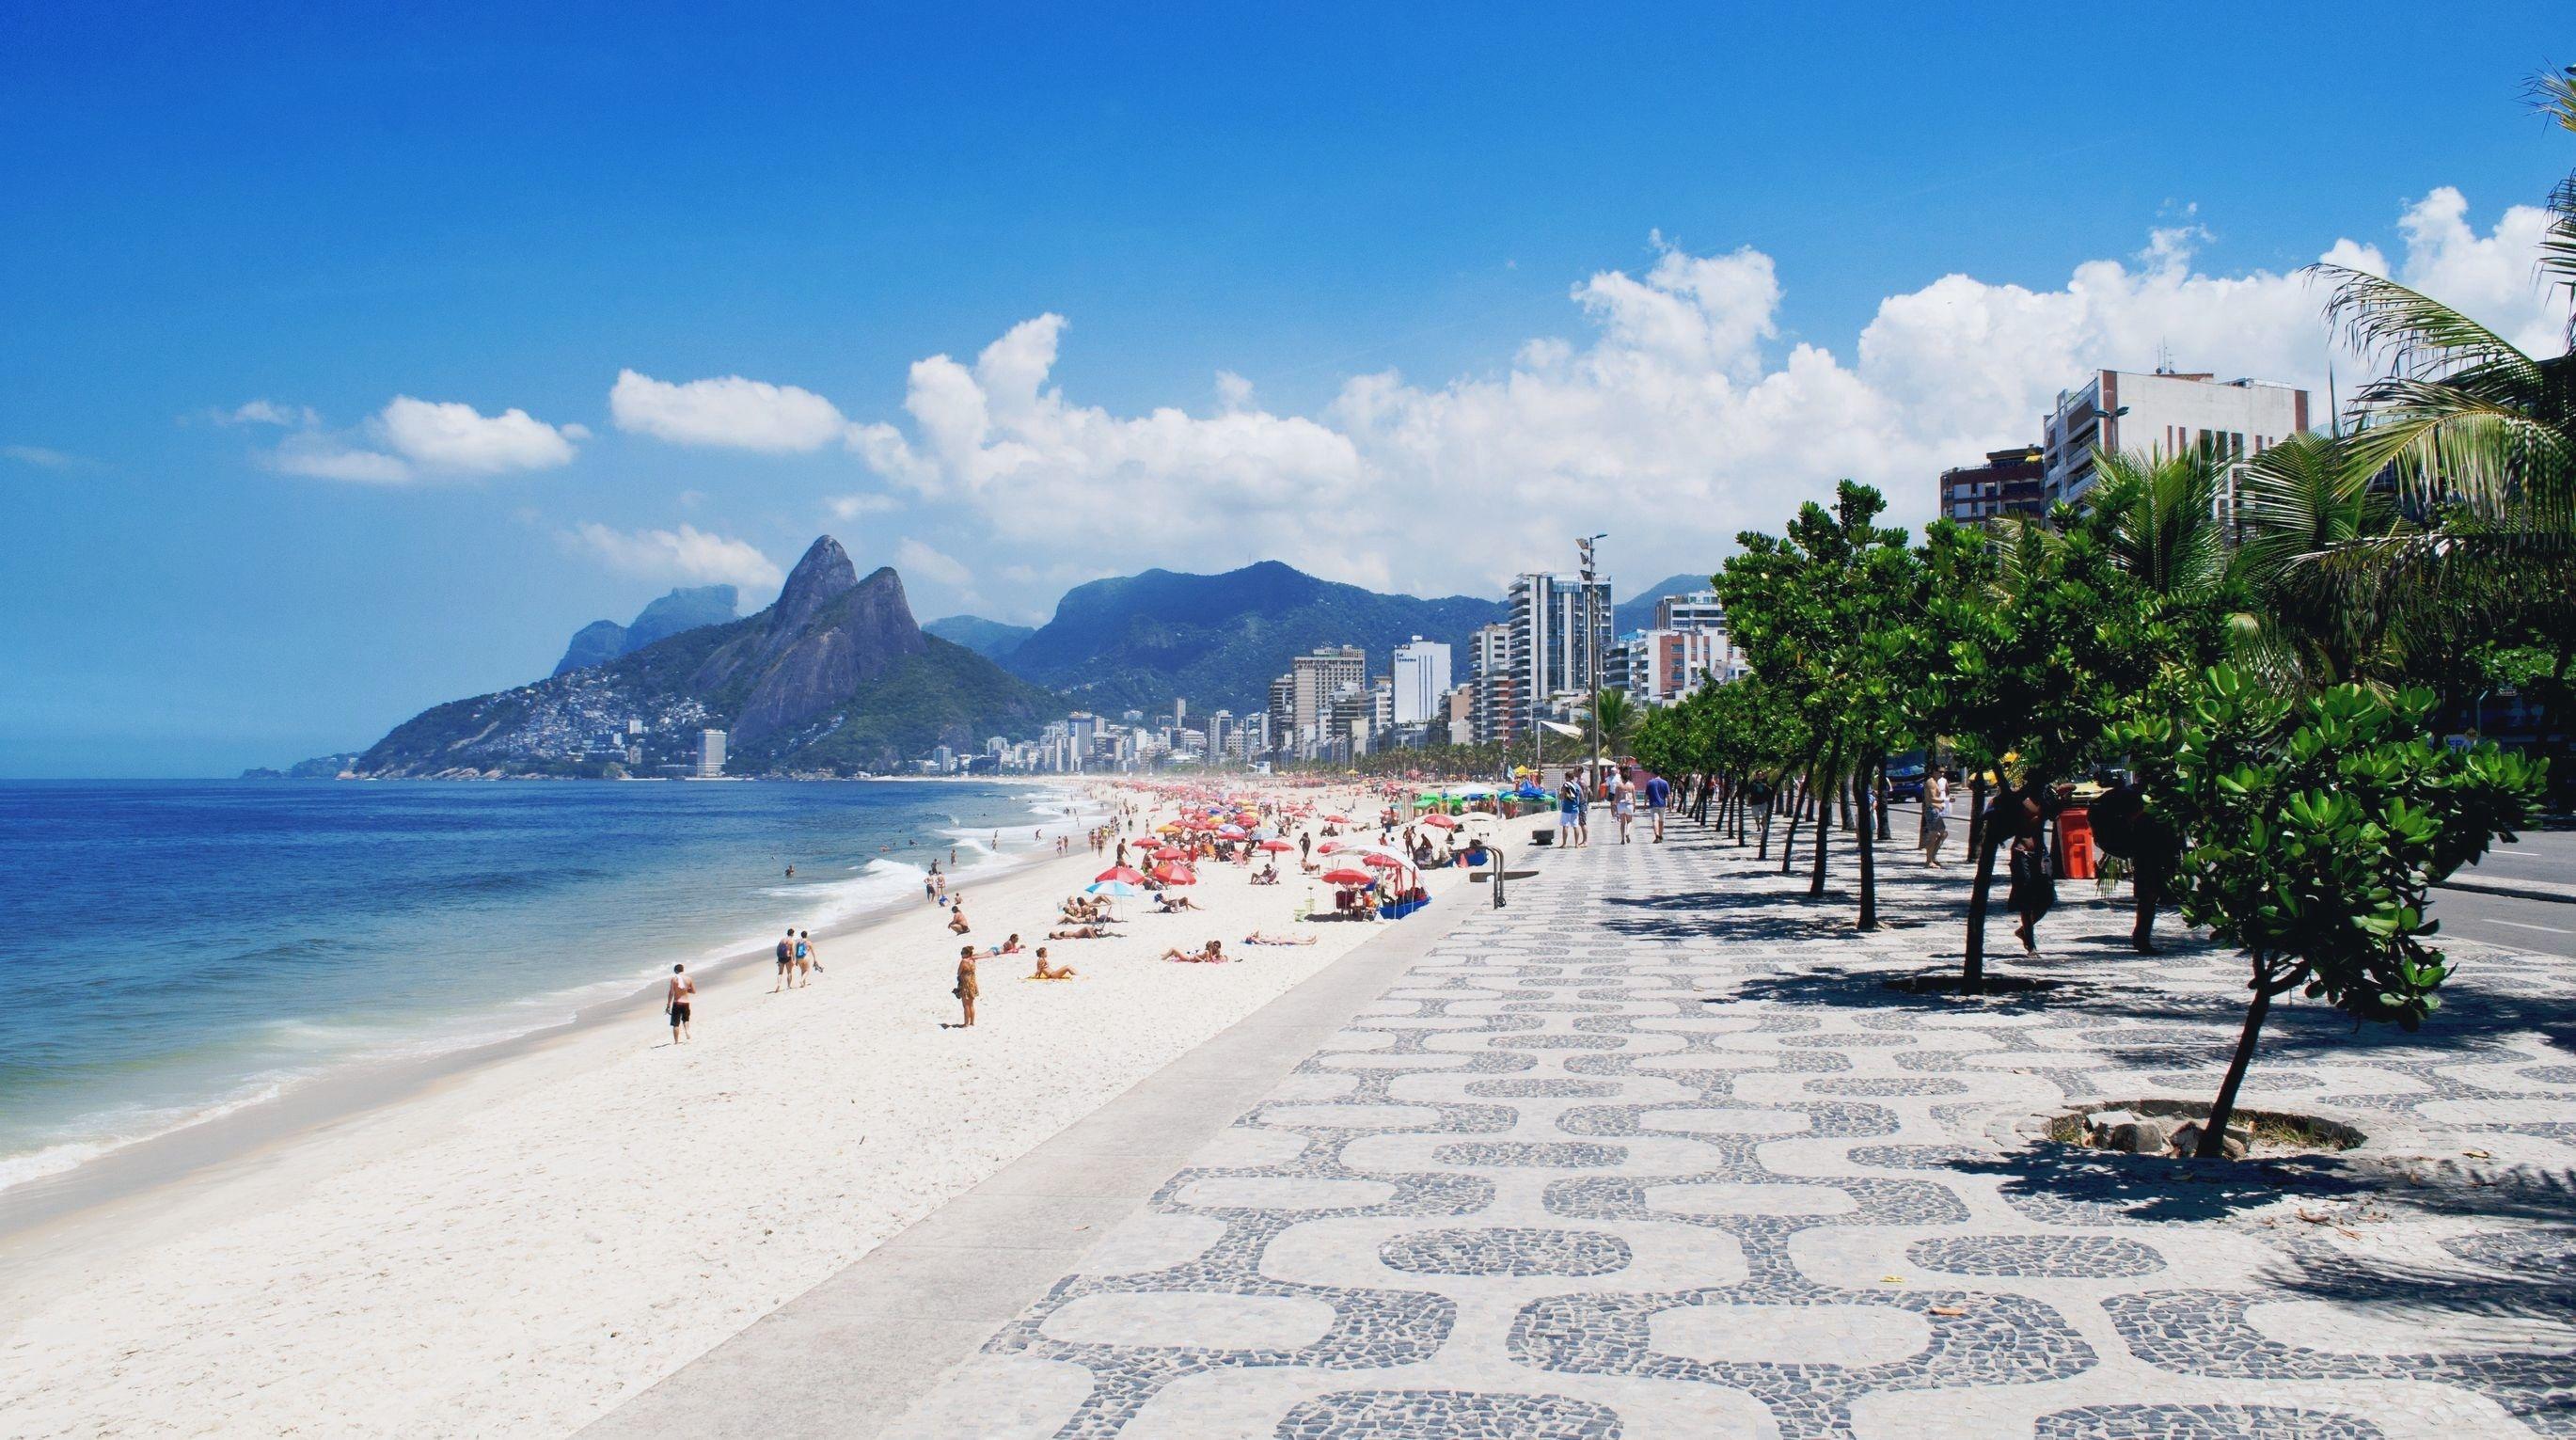 Rio De Janeiro Wallpapers Hd Travel Around The World Ipanema Beach Rio De Janeiro Ipanema Beach